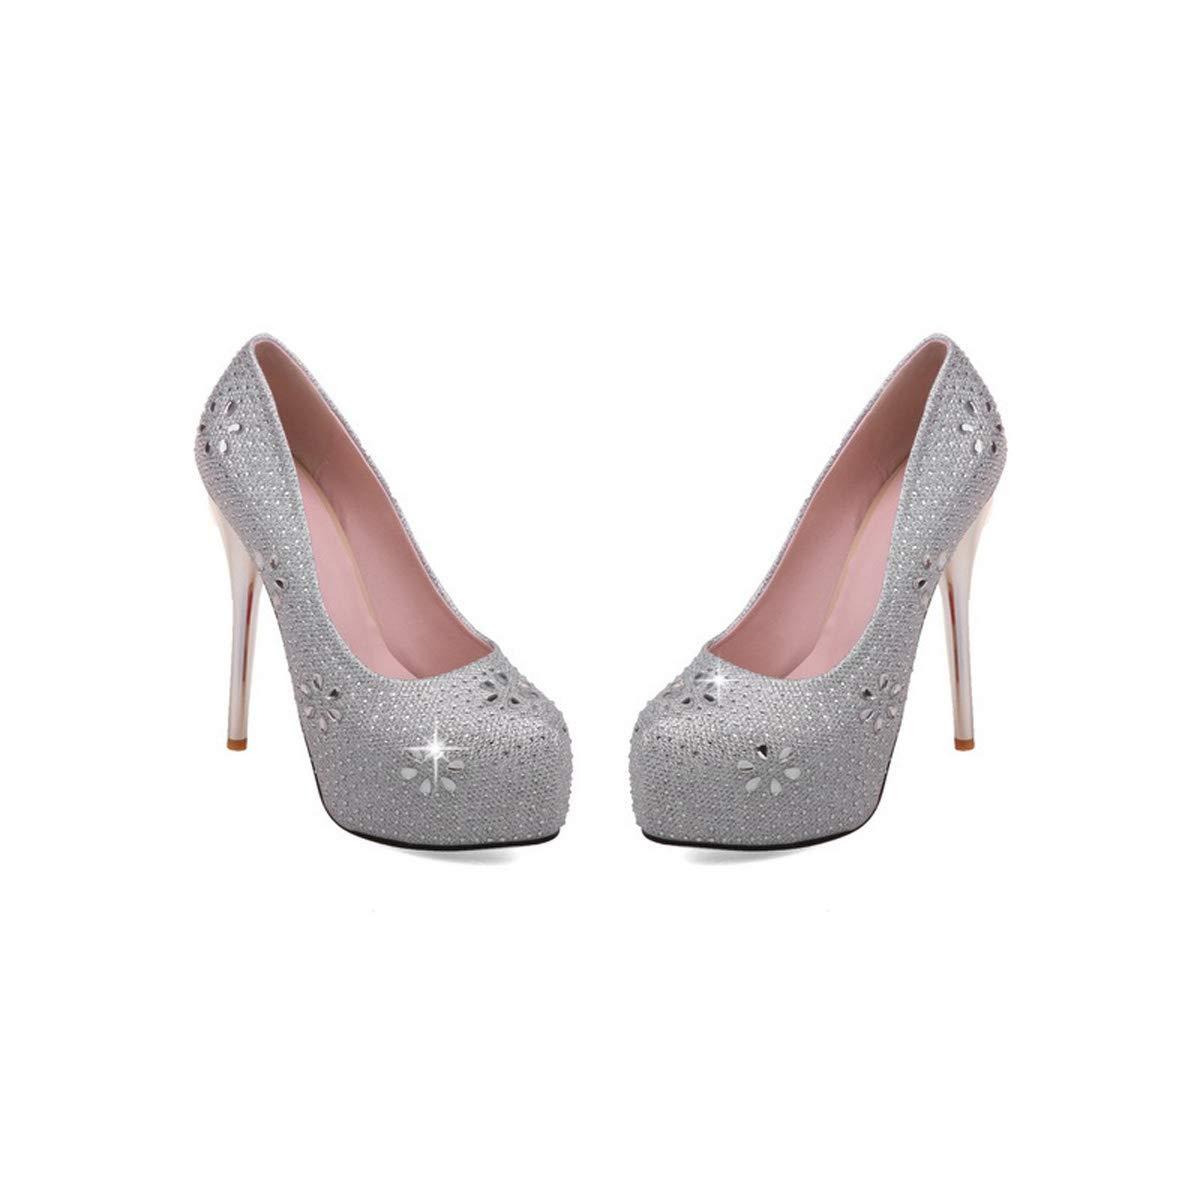 DANDANJIE Frauen Strass Hochzeit Schuhe Slip On On On High Heel Schuhe Frühling Stiletto Heel Party Court Schuhe  a4447b